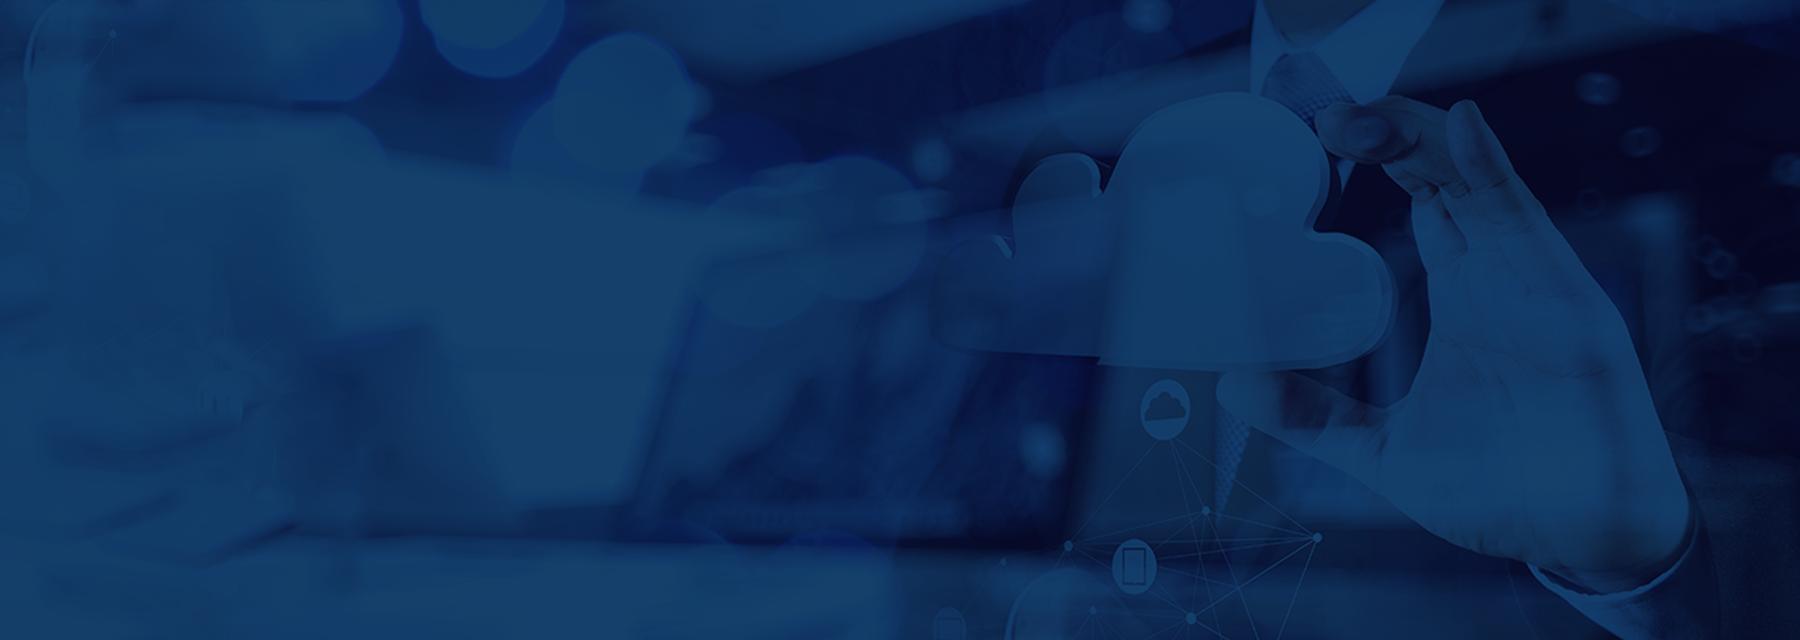 MyCloud Banner